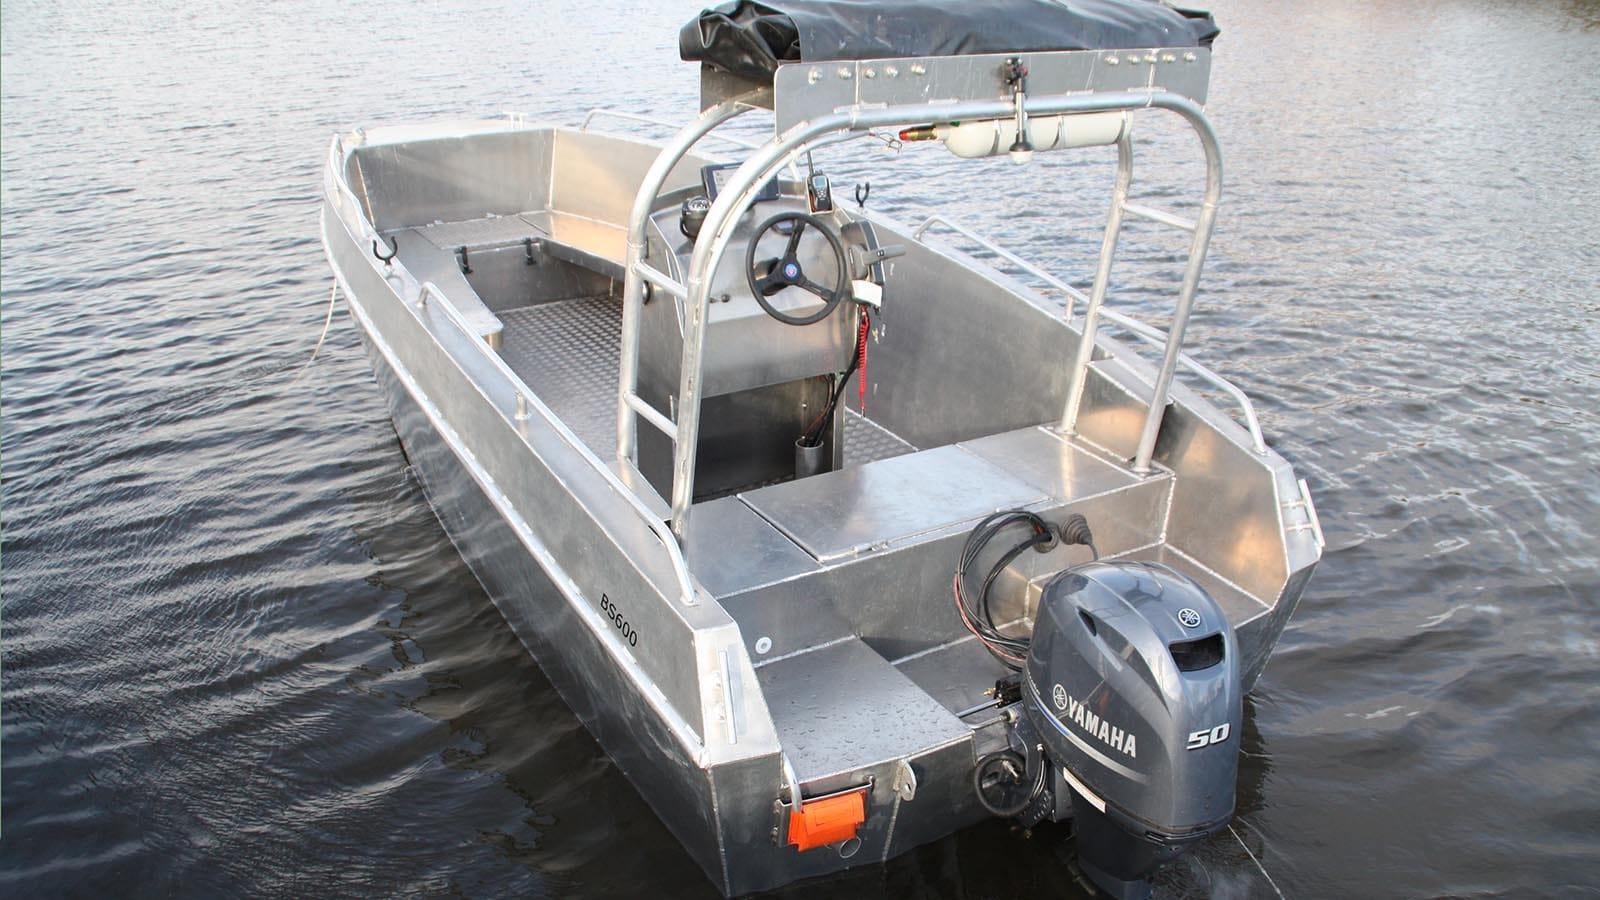 AluminiumJon.nl-BS 600 Rescue-Aluminium workboat a.o. suitable for port services